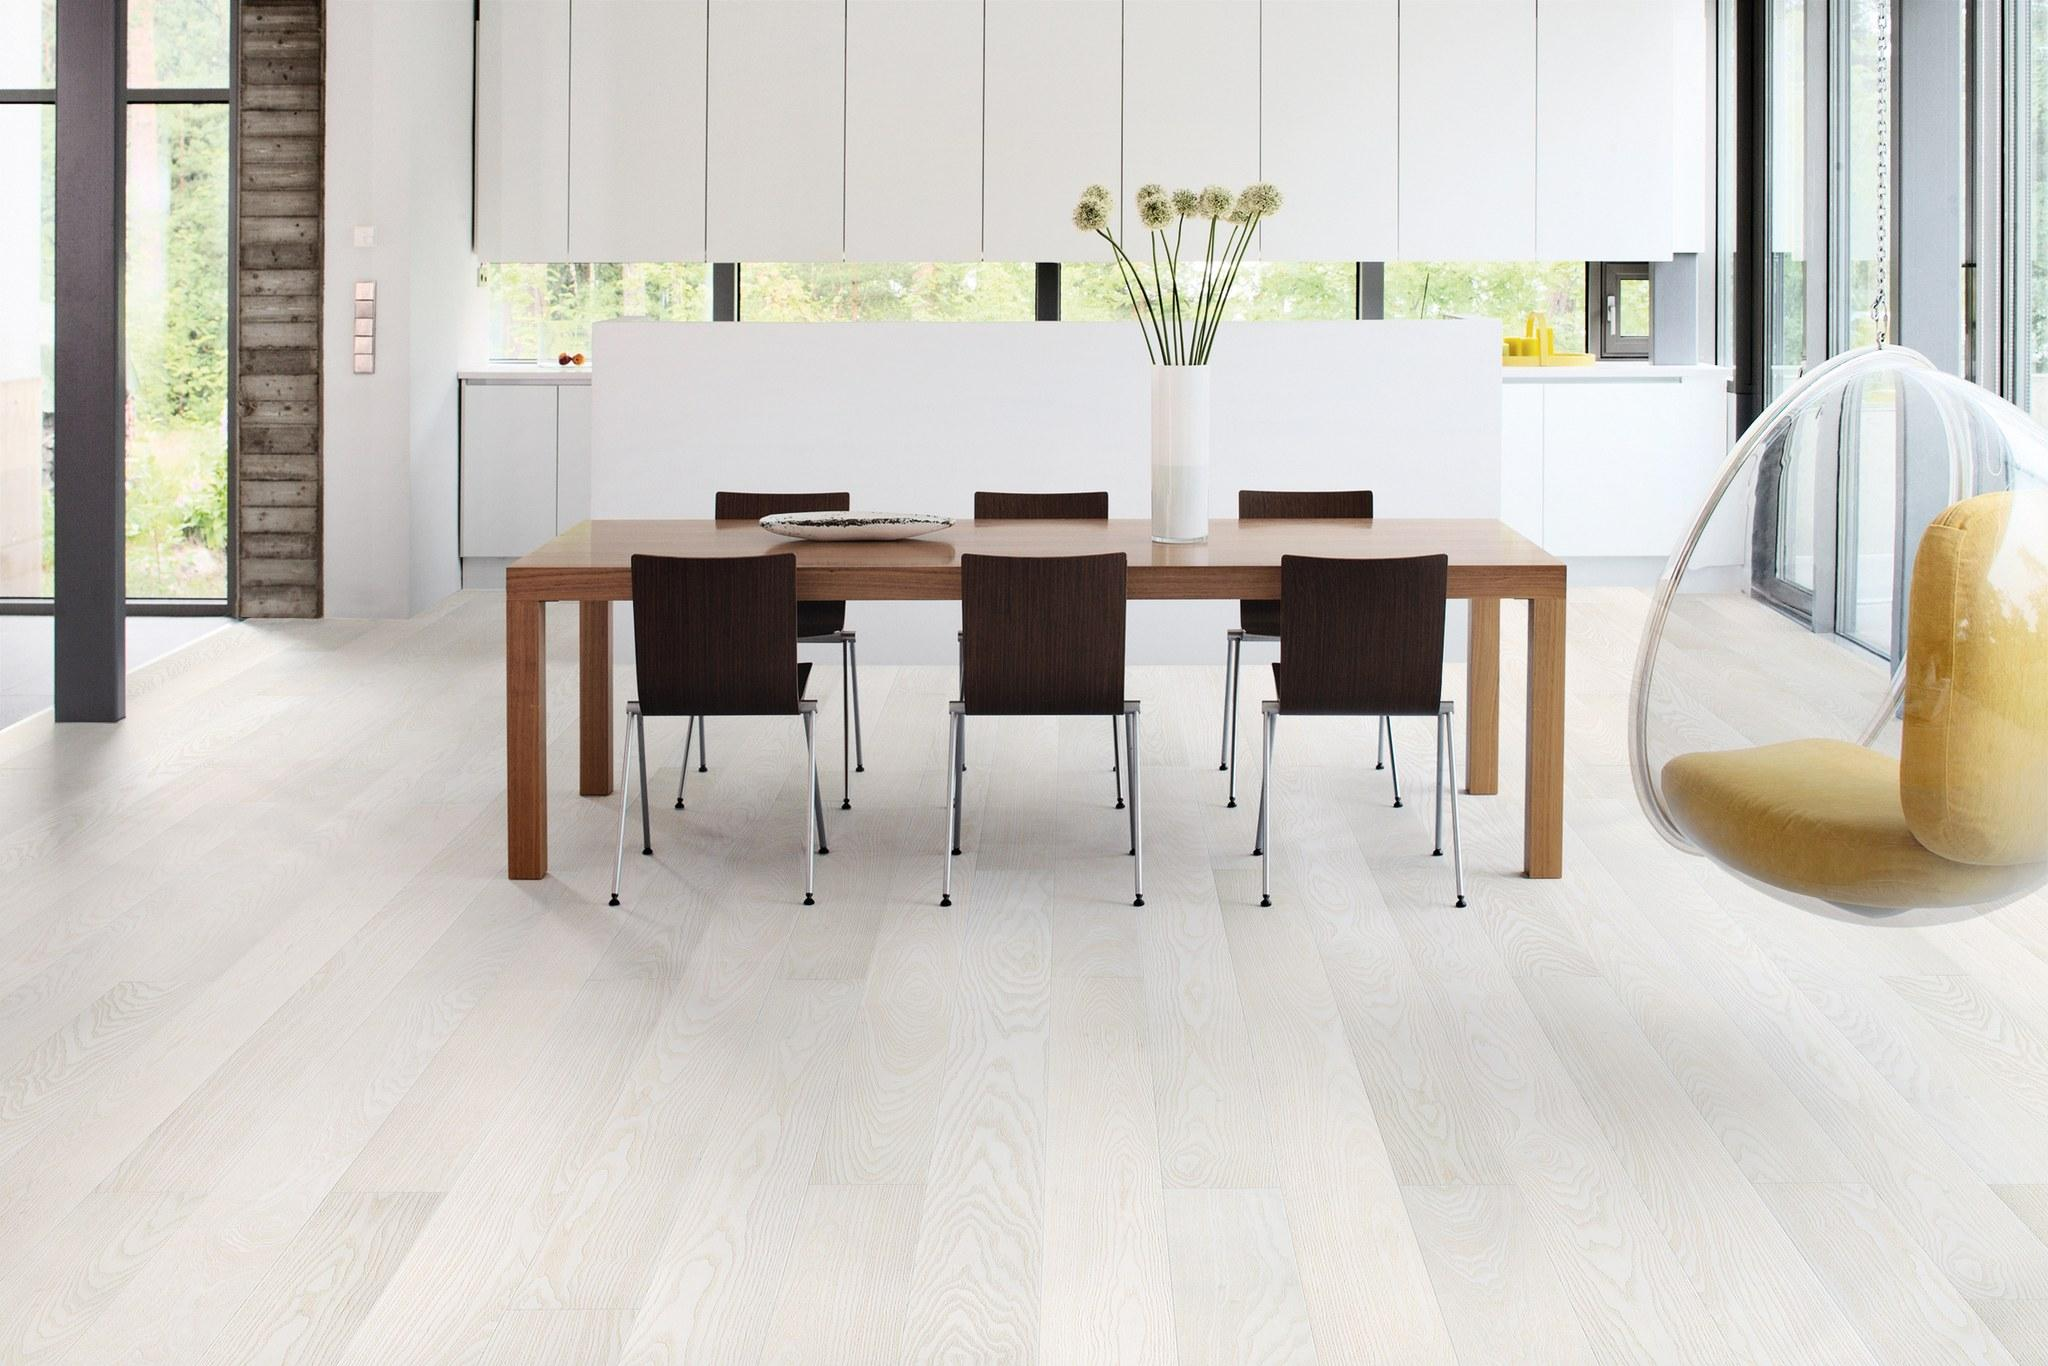 Timberwise parketti puulattia wooden floor parquet Saarni Ash Antarctis